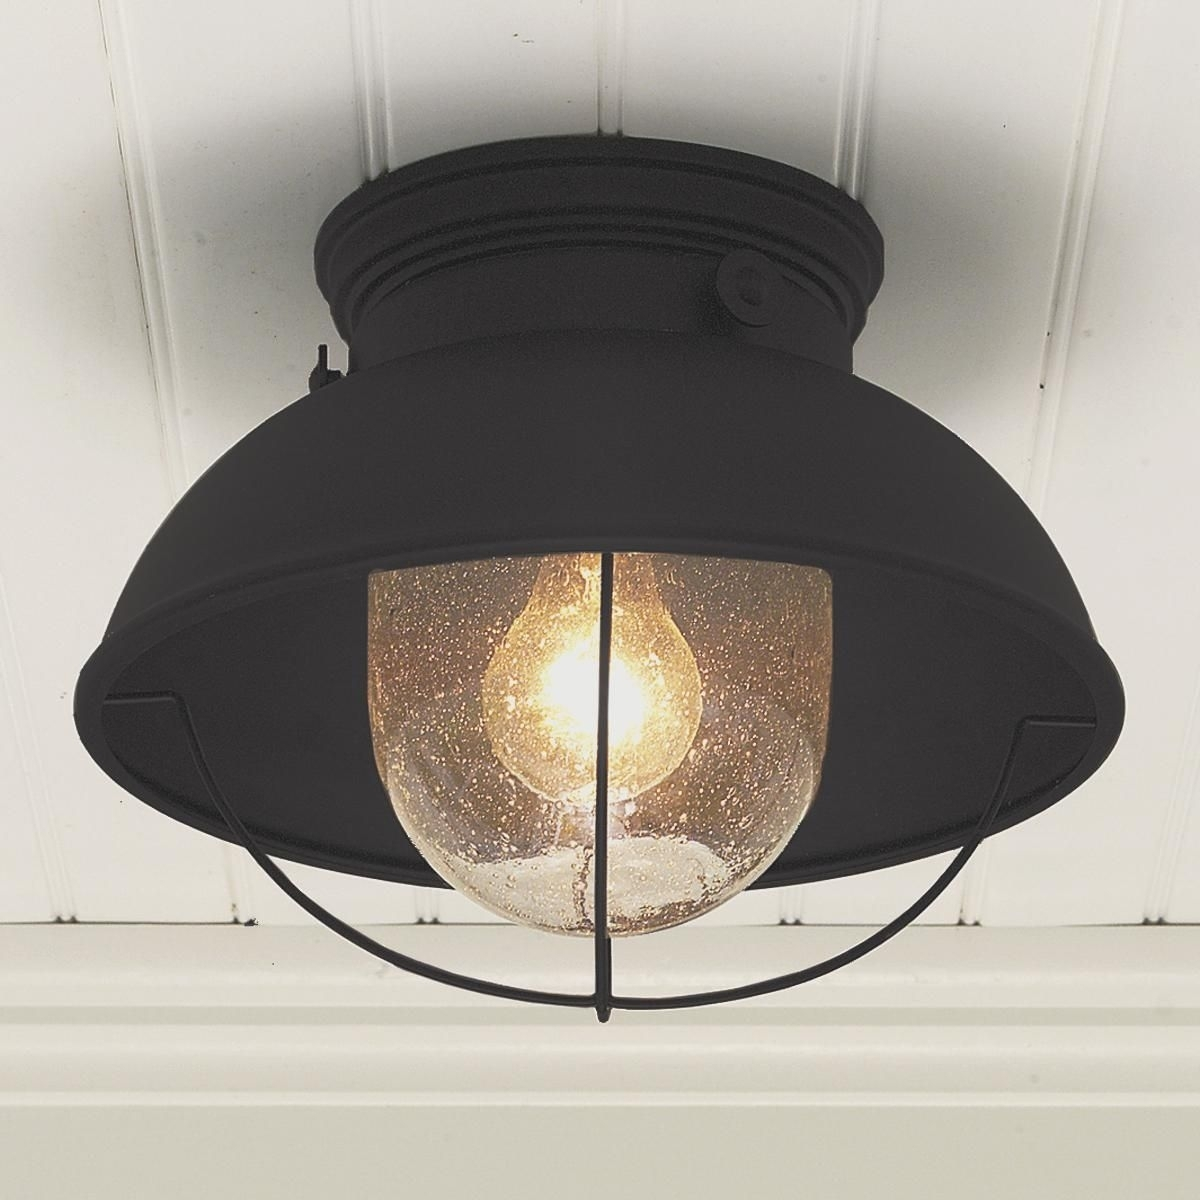 Ceiling Light : Outdoor Ceiling Lights Homebase Outdoor Ceiling In Melbourne Outdoor Ceiling Lights (#3 of 15)